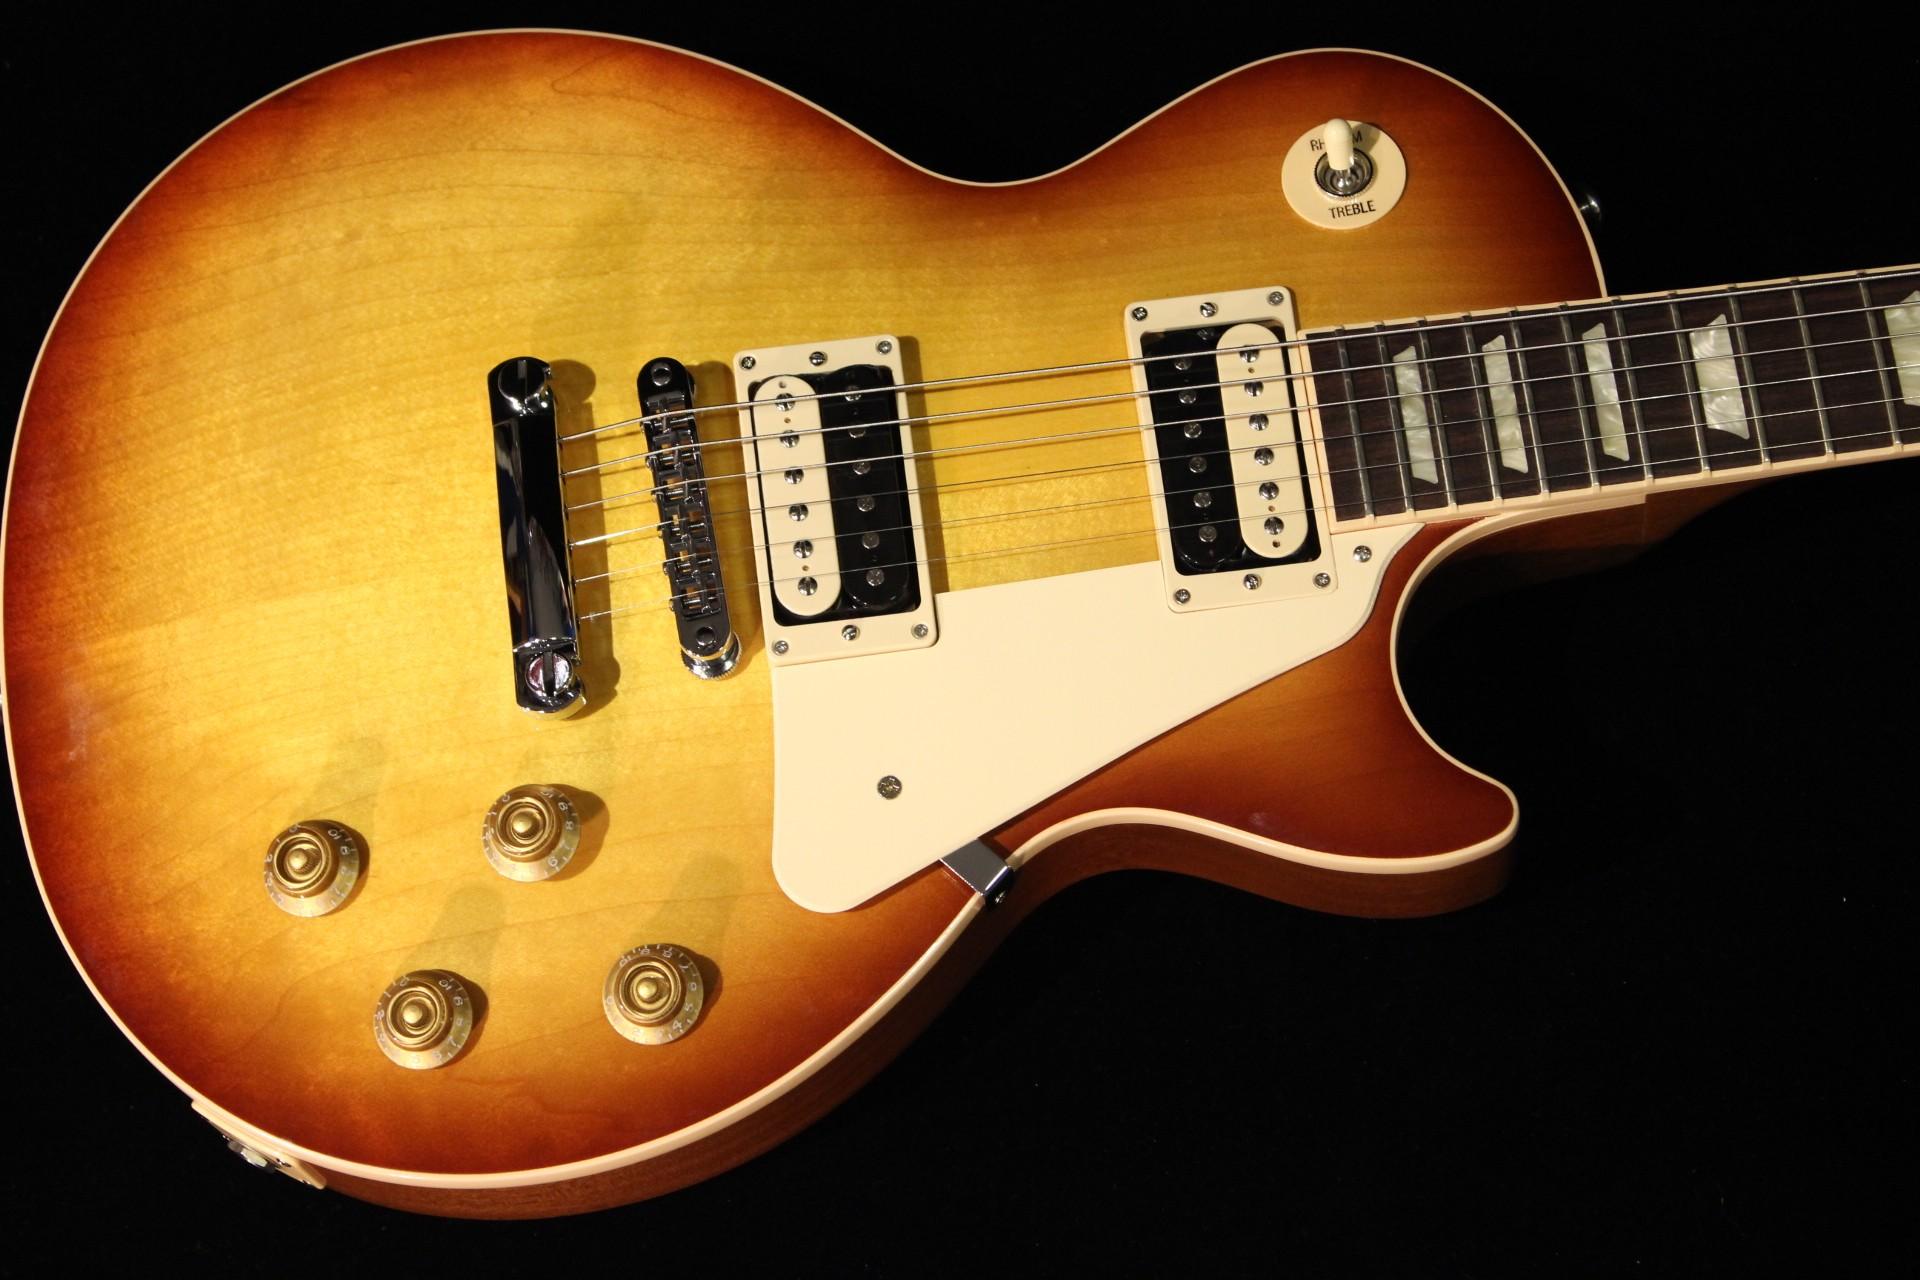 gibson les paul traditional pro iii honey burst sn 150068110 gino guitars. Black Bedroom Furniture Sets. Home Design Ideas